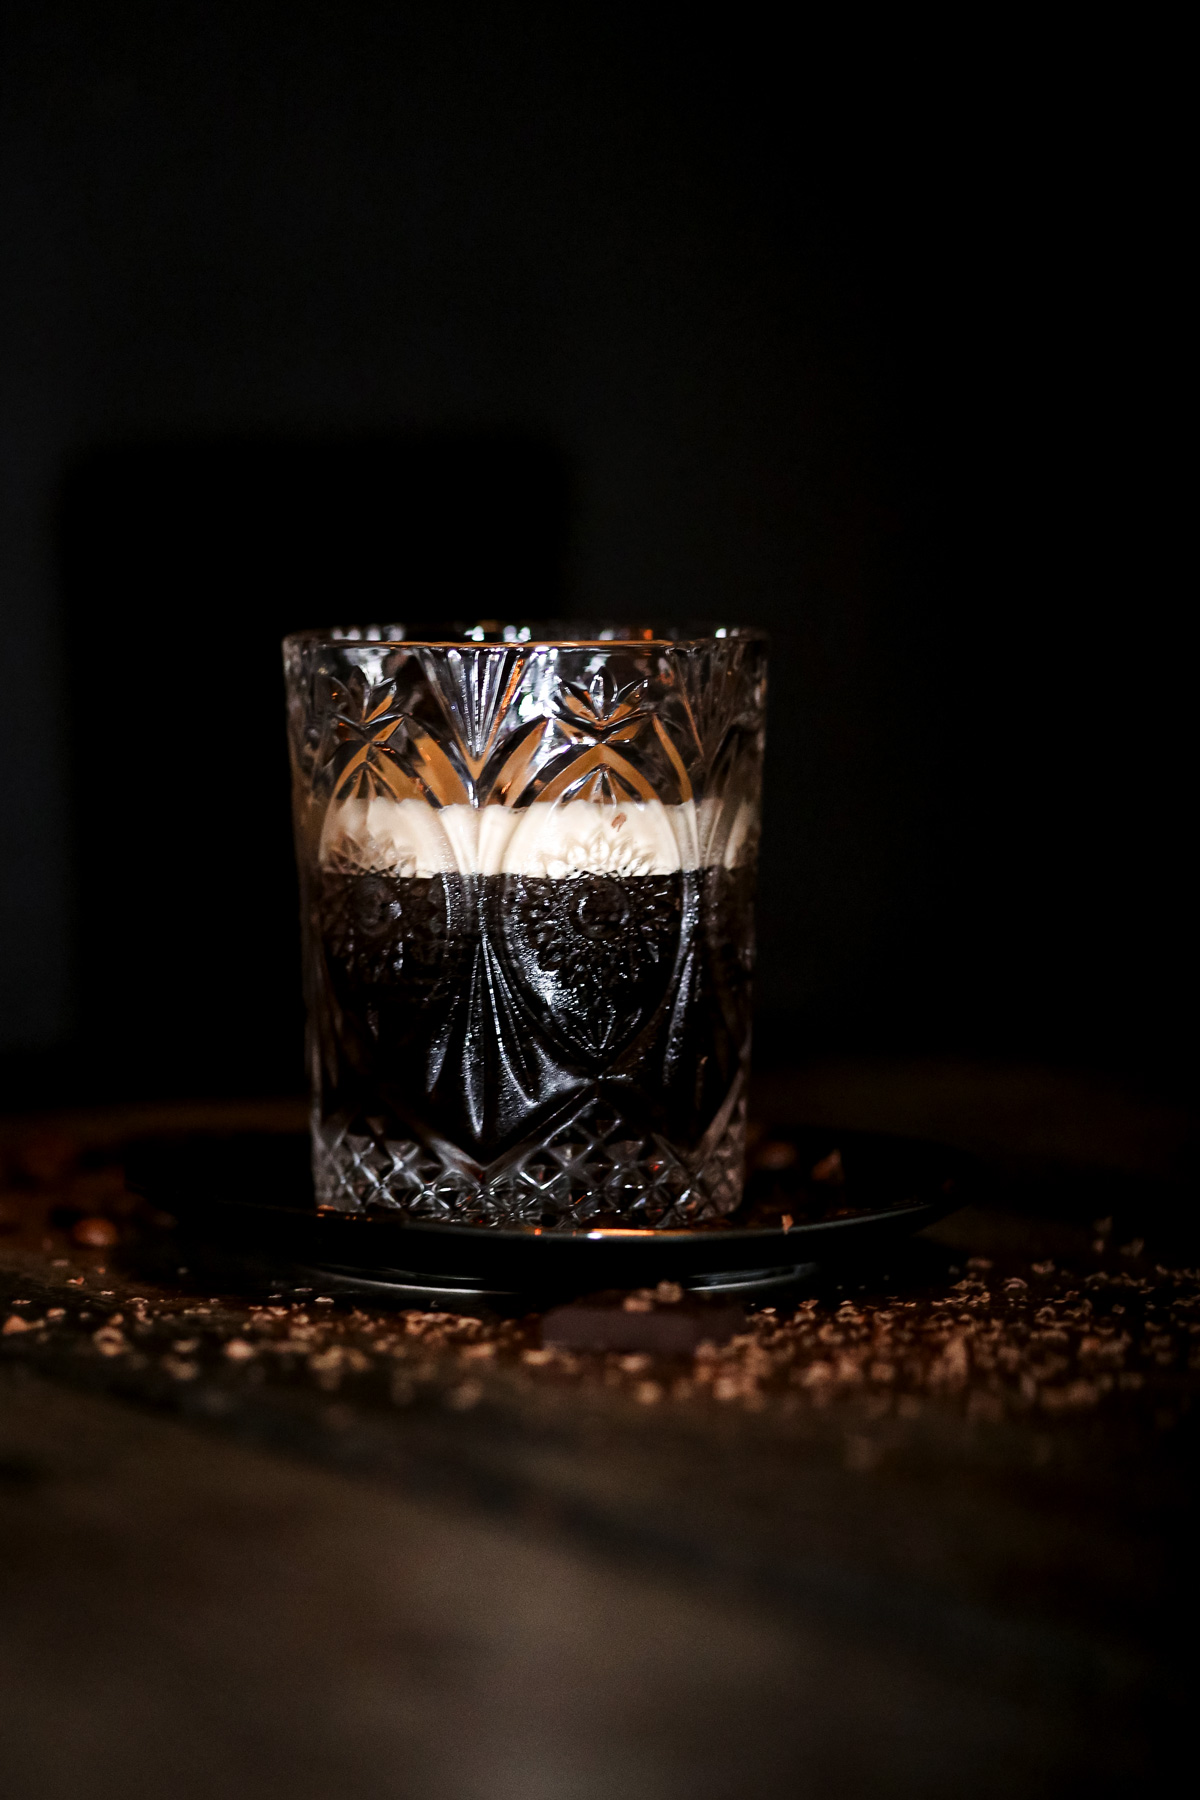 licor43-cocktail-photoshoot-studiovolt-3